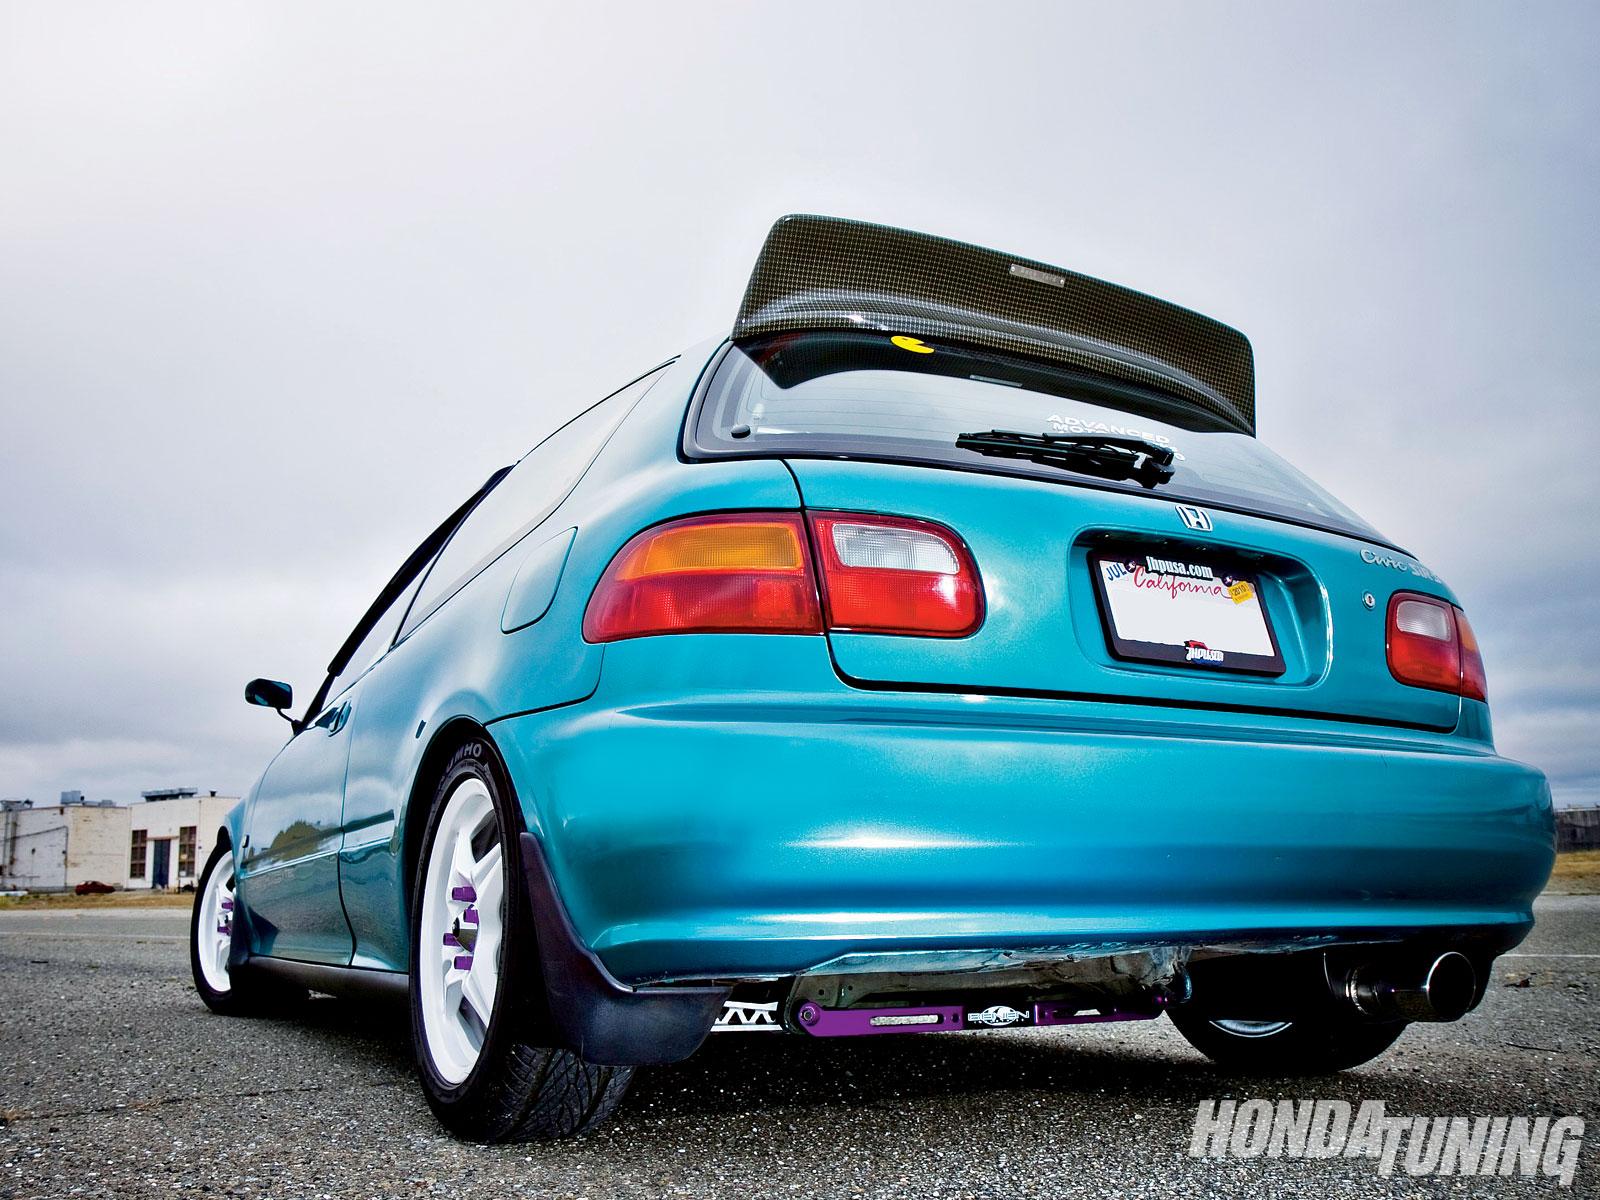 16] Honda Civic EG Hatch Wallpapers on WallpaperSafari 1600x1200